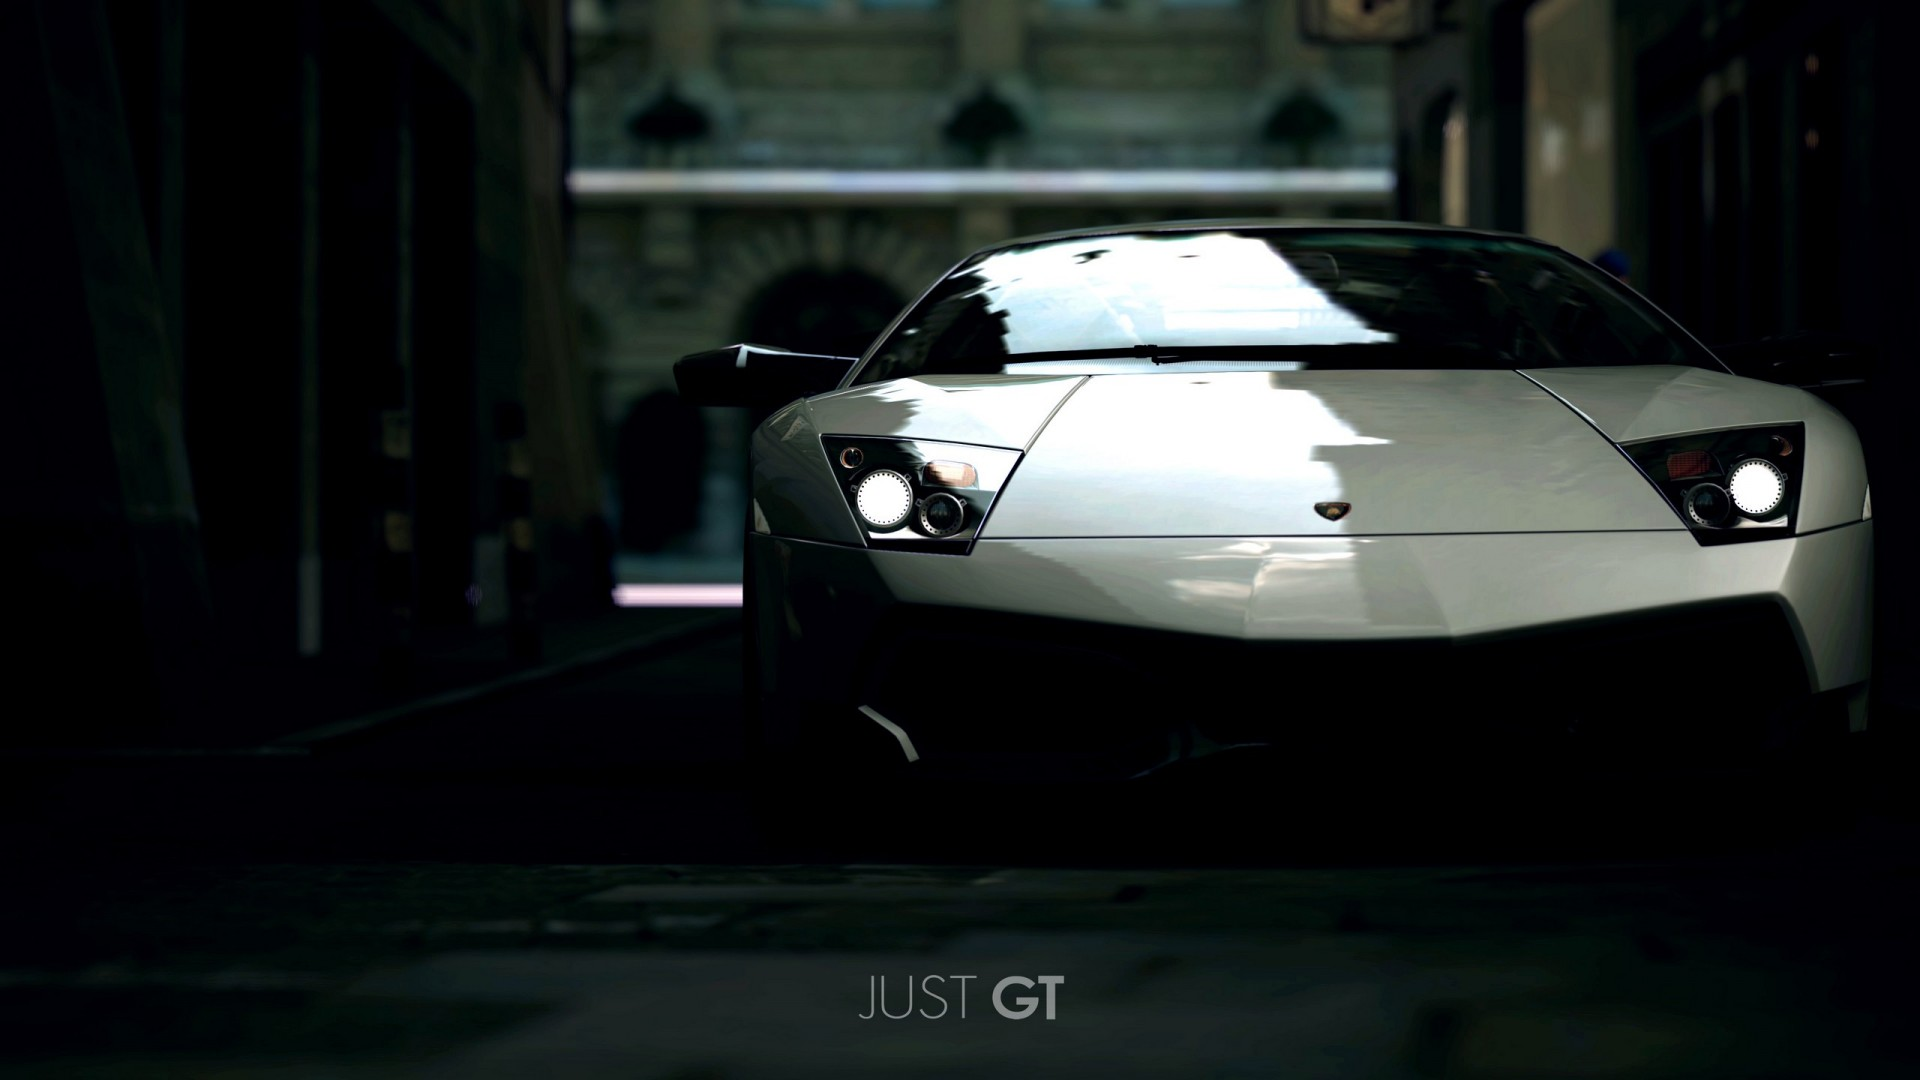 Lamborghini Super GT Wallpaper | HD Car Wallpapers | ID #2838